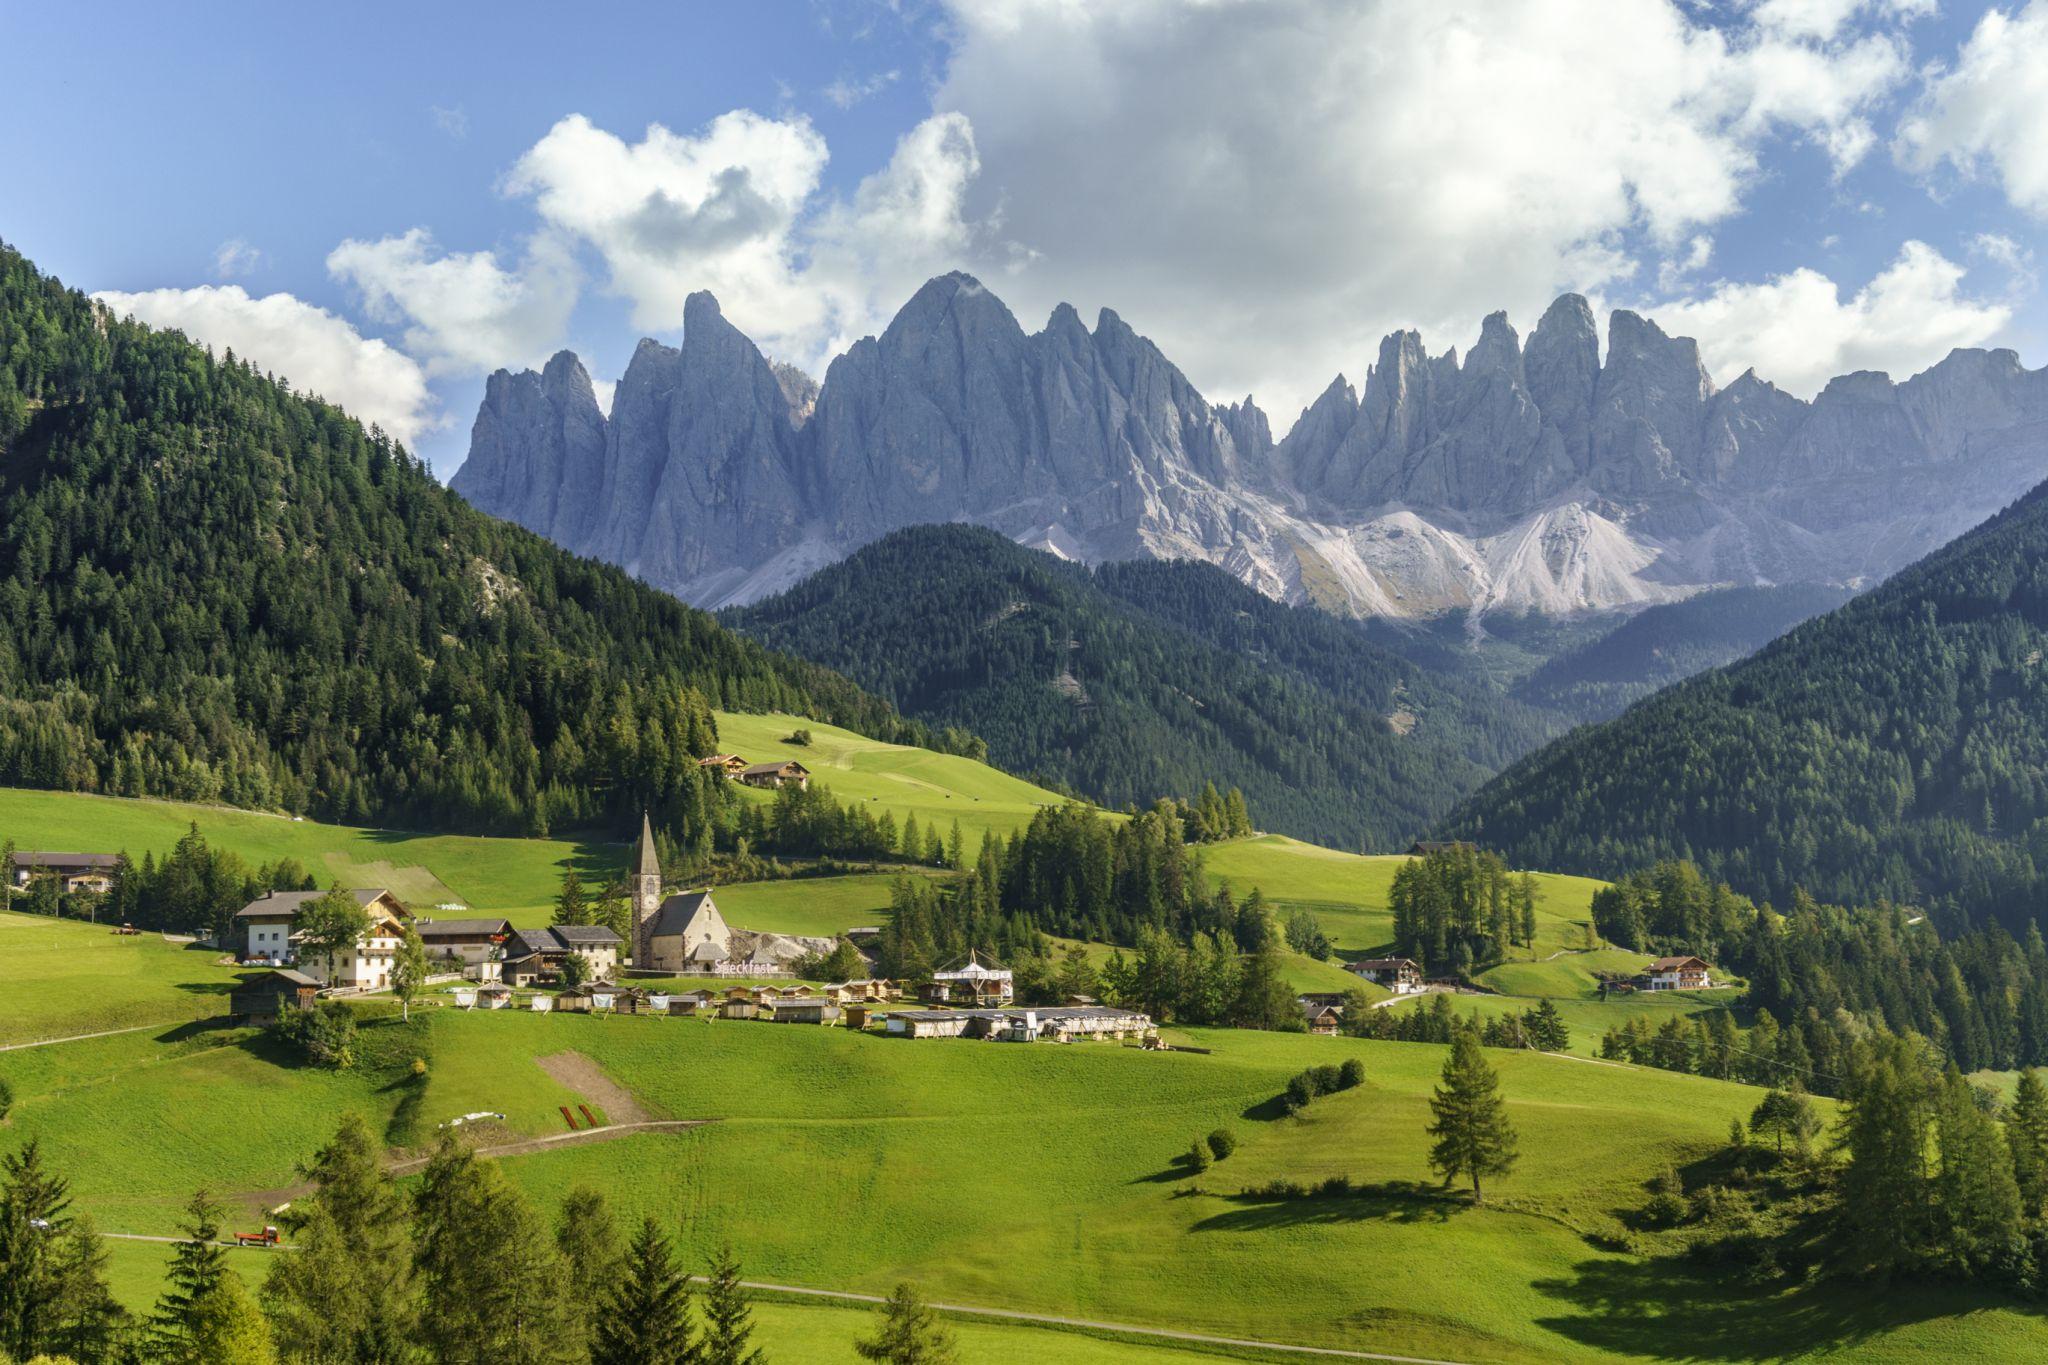 Val di Funes - Villnösser Tal, Italy